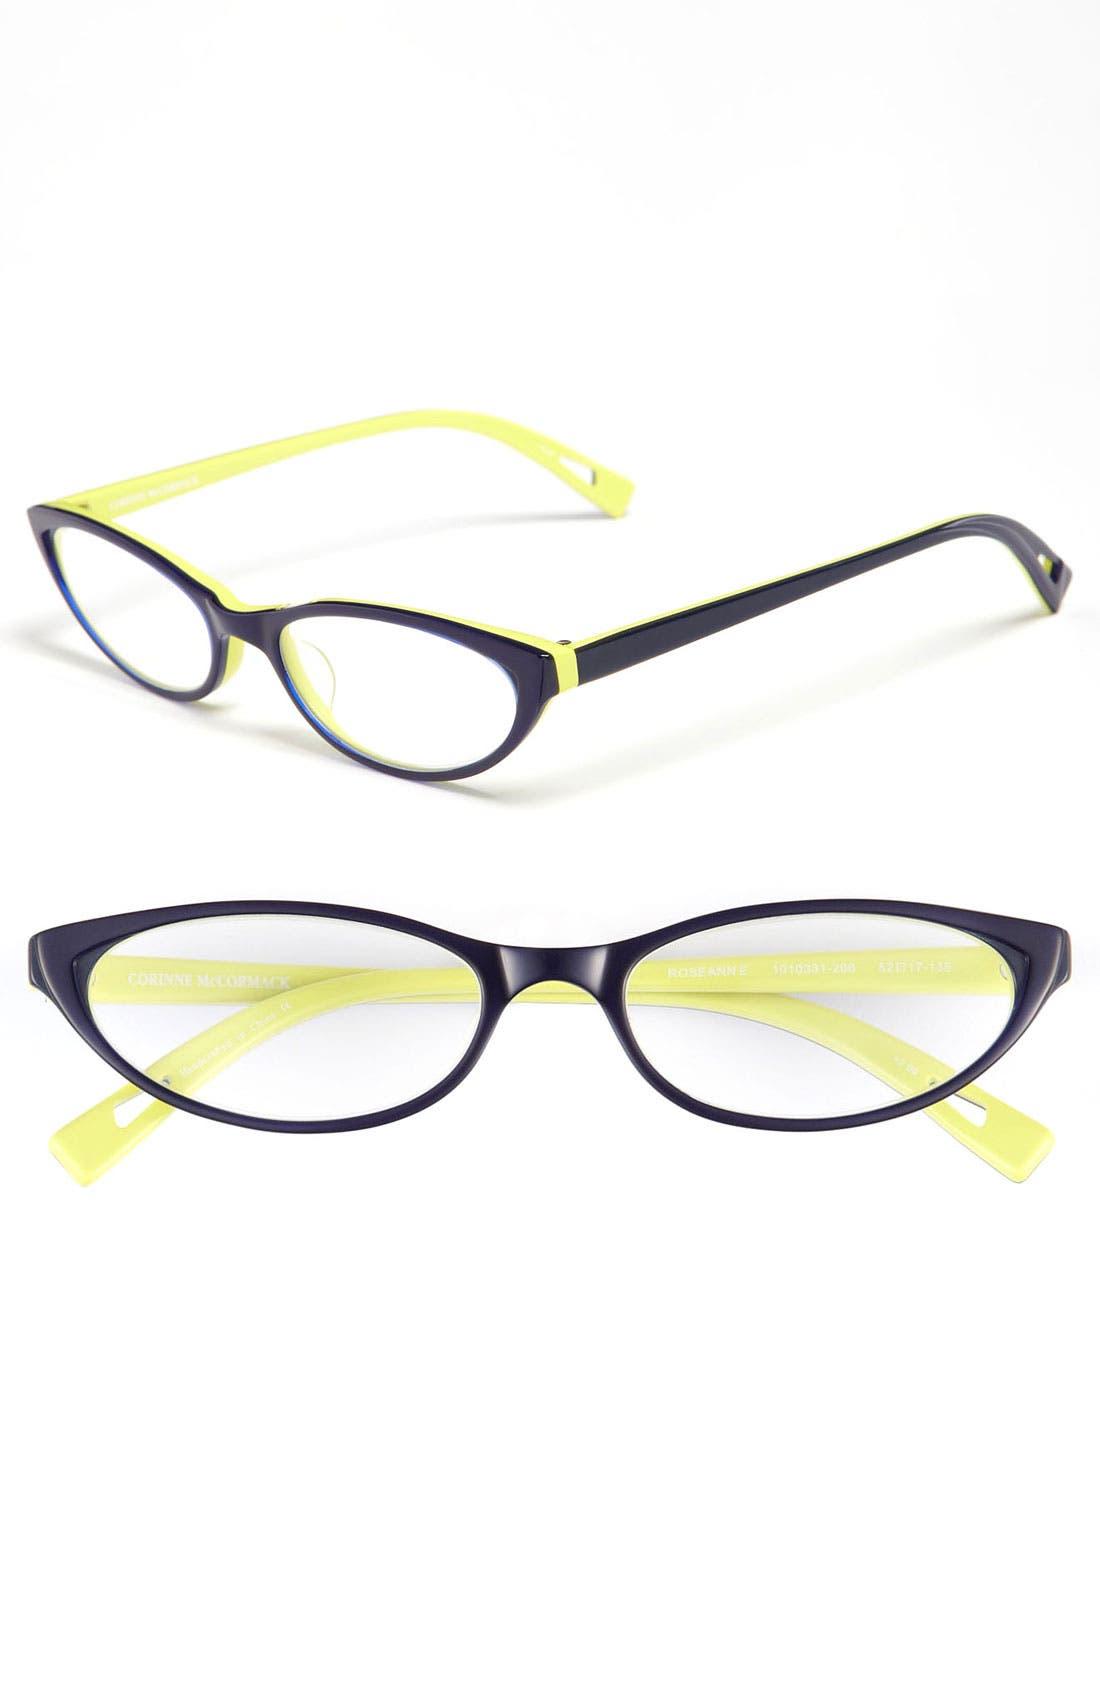 Alternate Image 1 Selected - Corinne McCormack Reading Glasses (2 for $88)